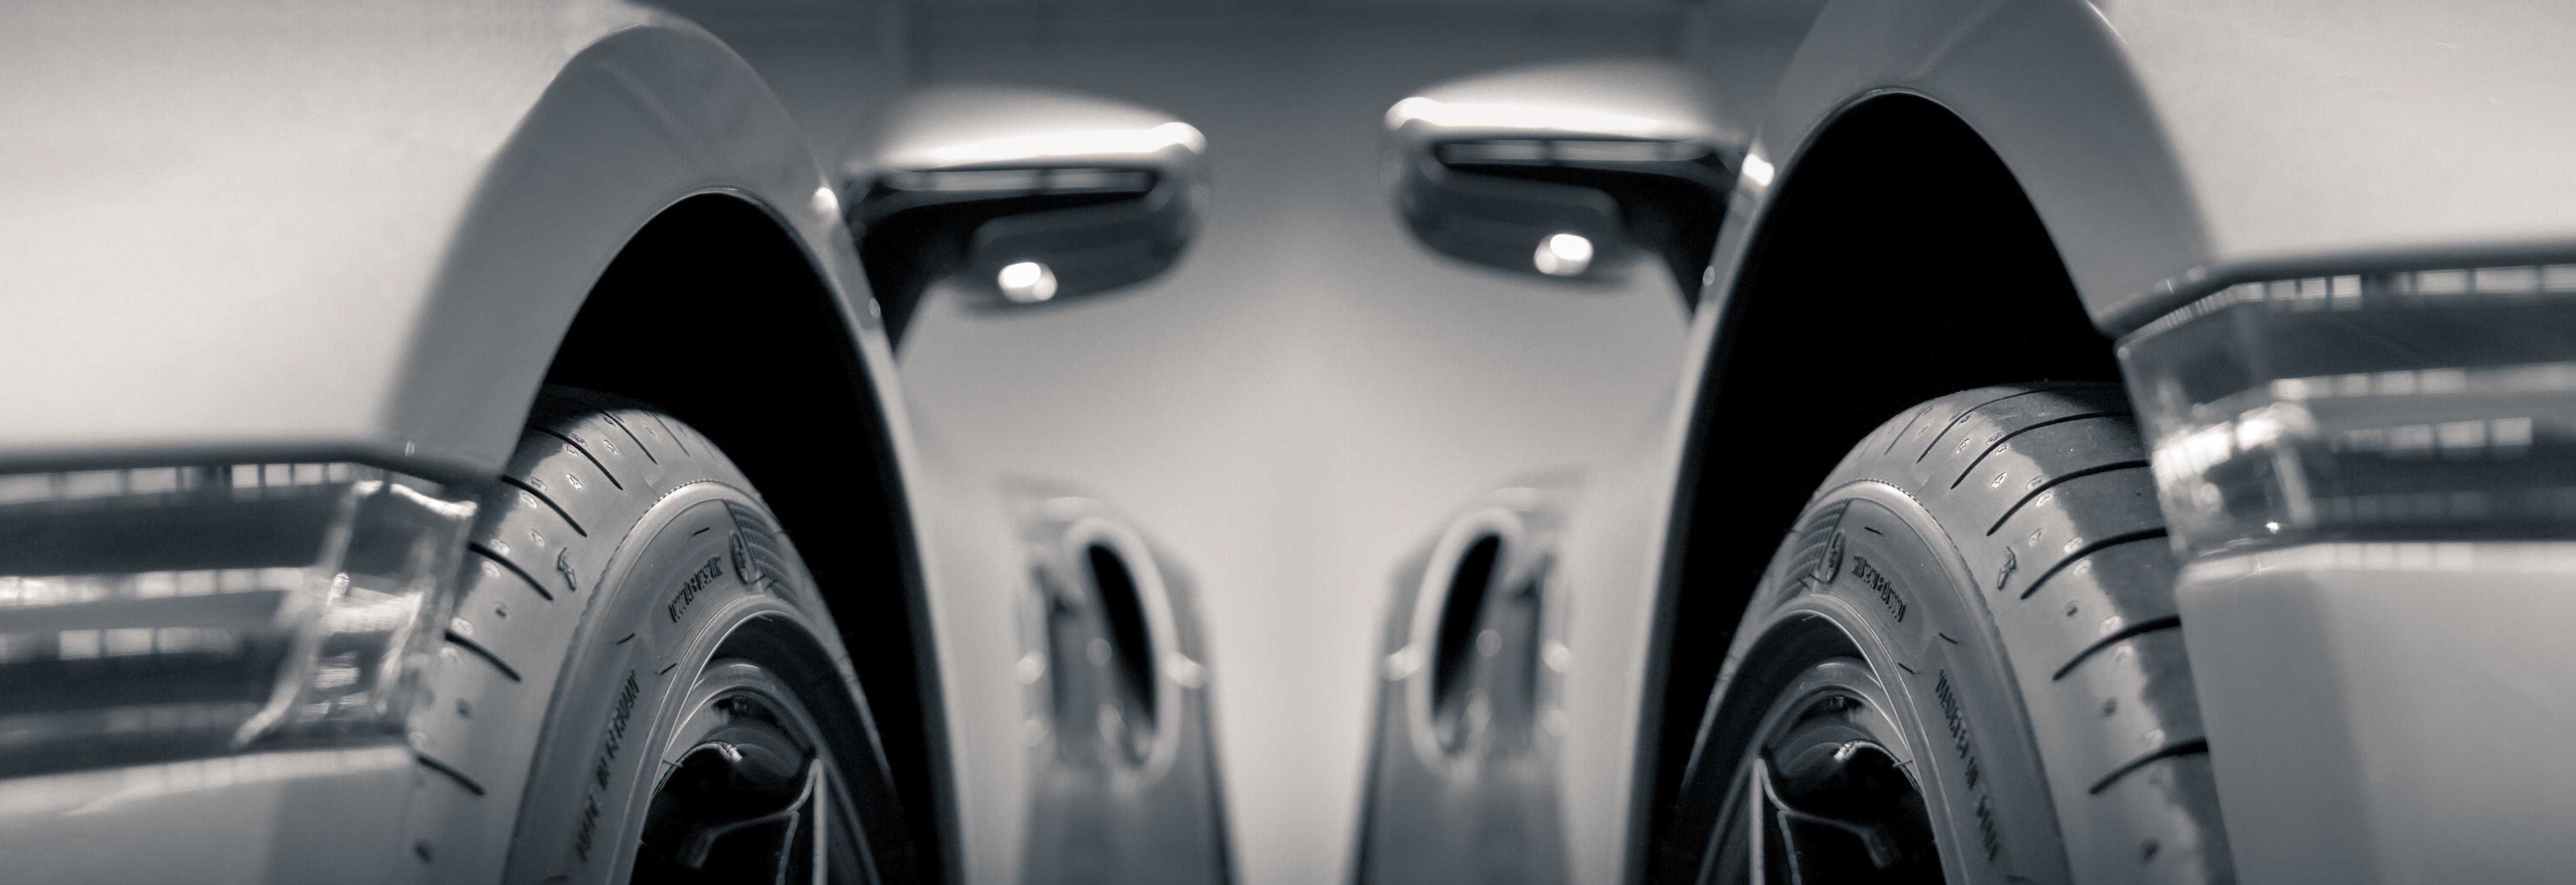 Porsche liftsysteem Foto Noël van Bilsen